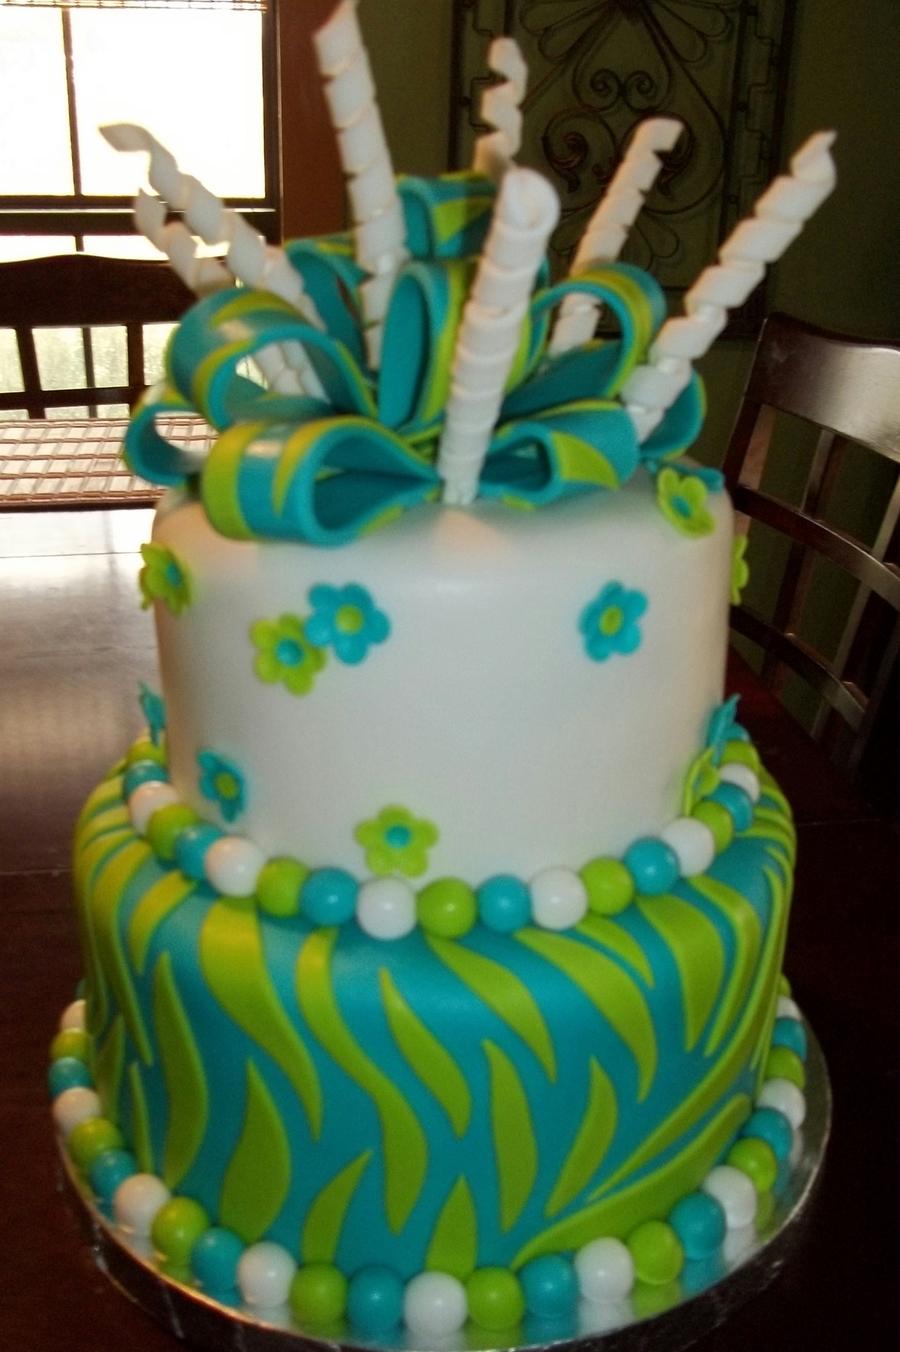 Groovy Green Blue Zebra Birthday Cake Cakecentral Com Birthday Cards Printable Inklcafe Filternl